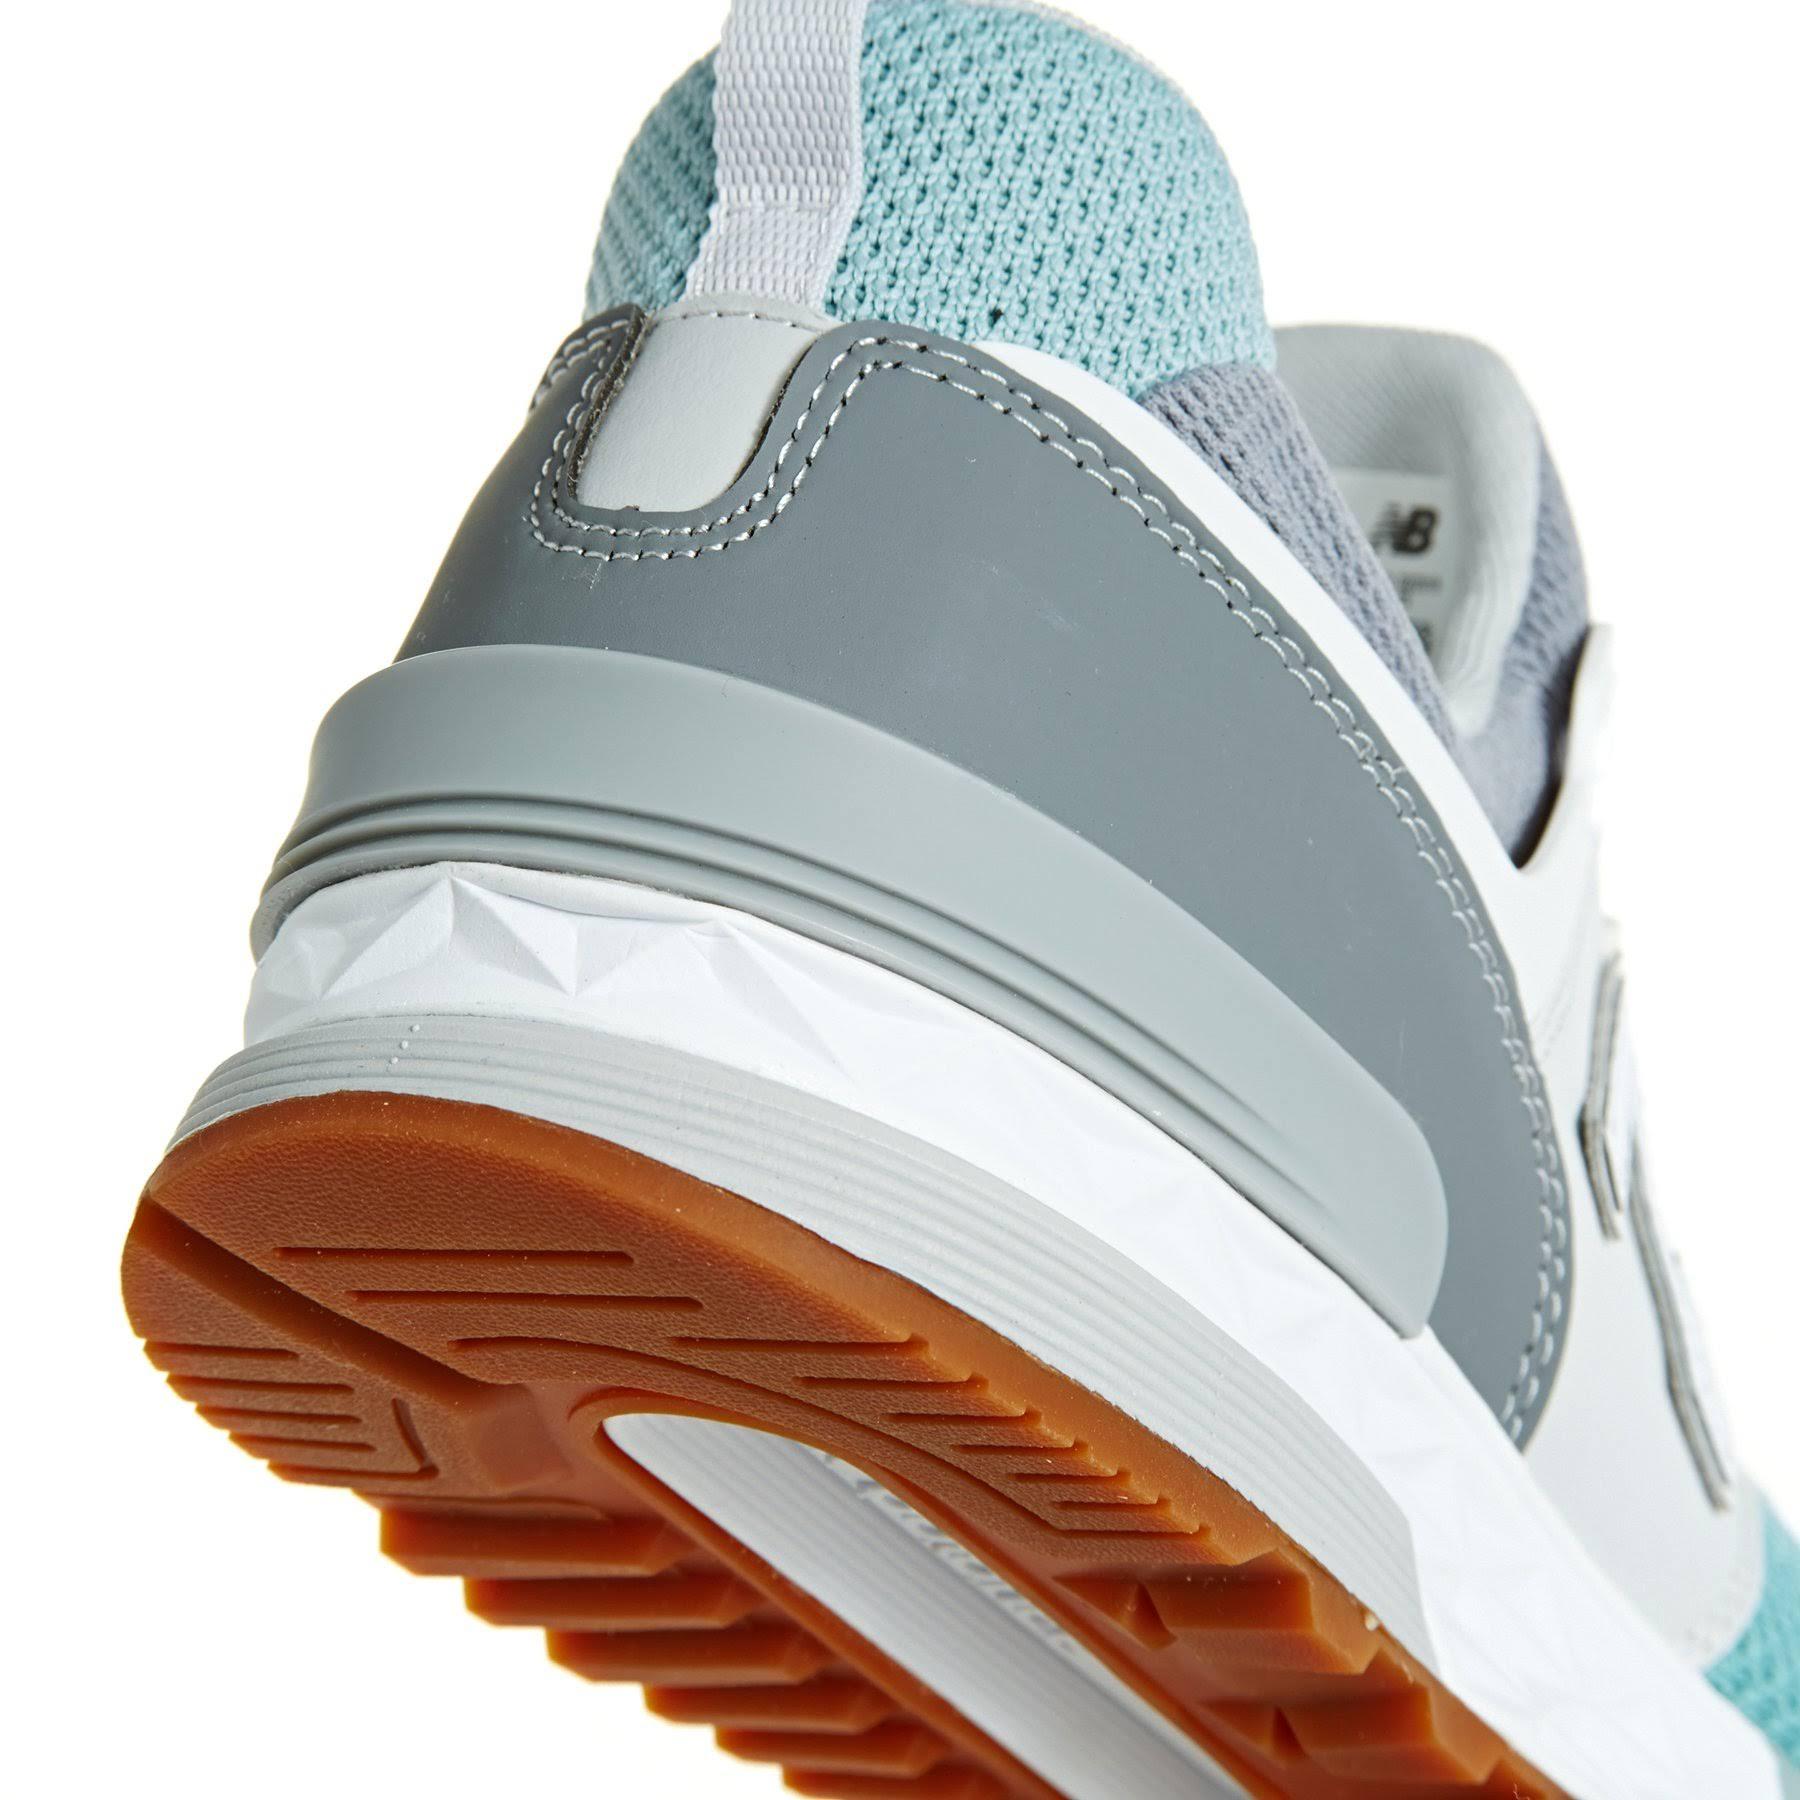 New Para Sport 574 Knit Gunmetal Shoe Hombre 5 Balance Storm 9 Blue r7qSrwFCTn